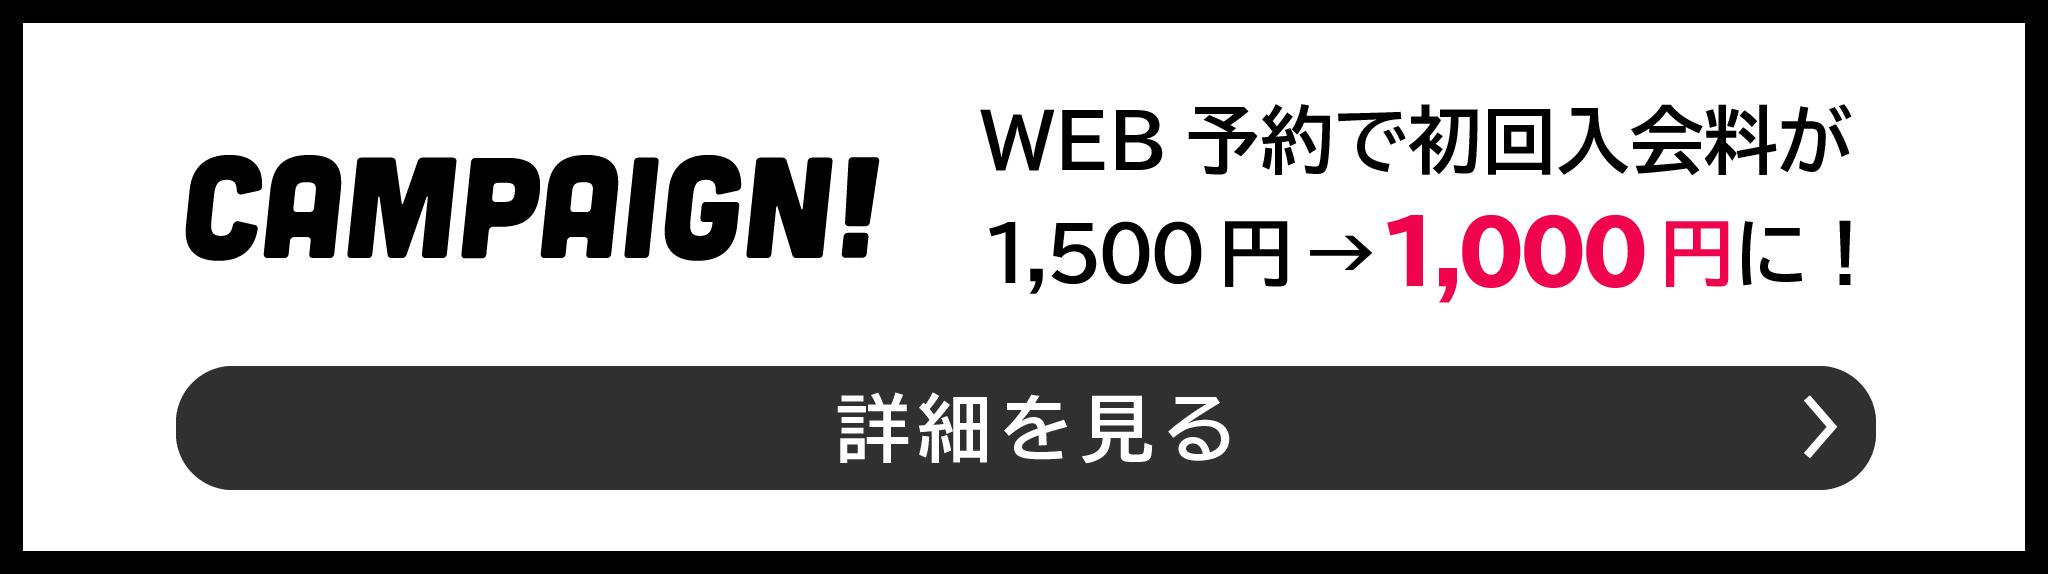 WEB予約で初回入館料が1500円から1000円に!